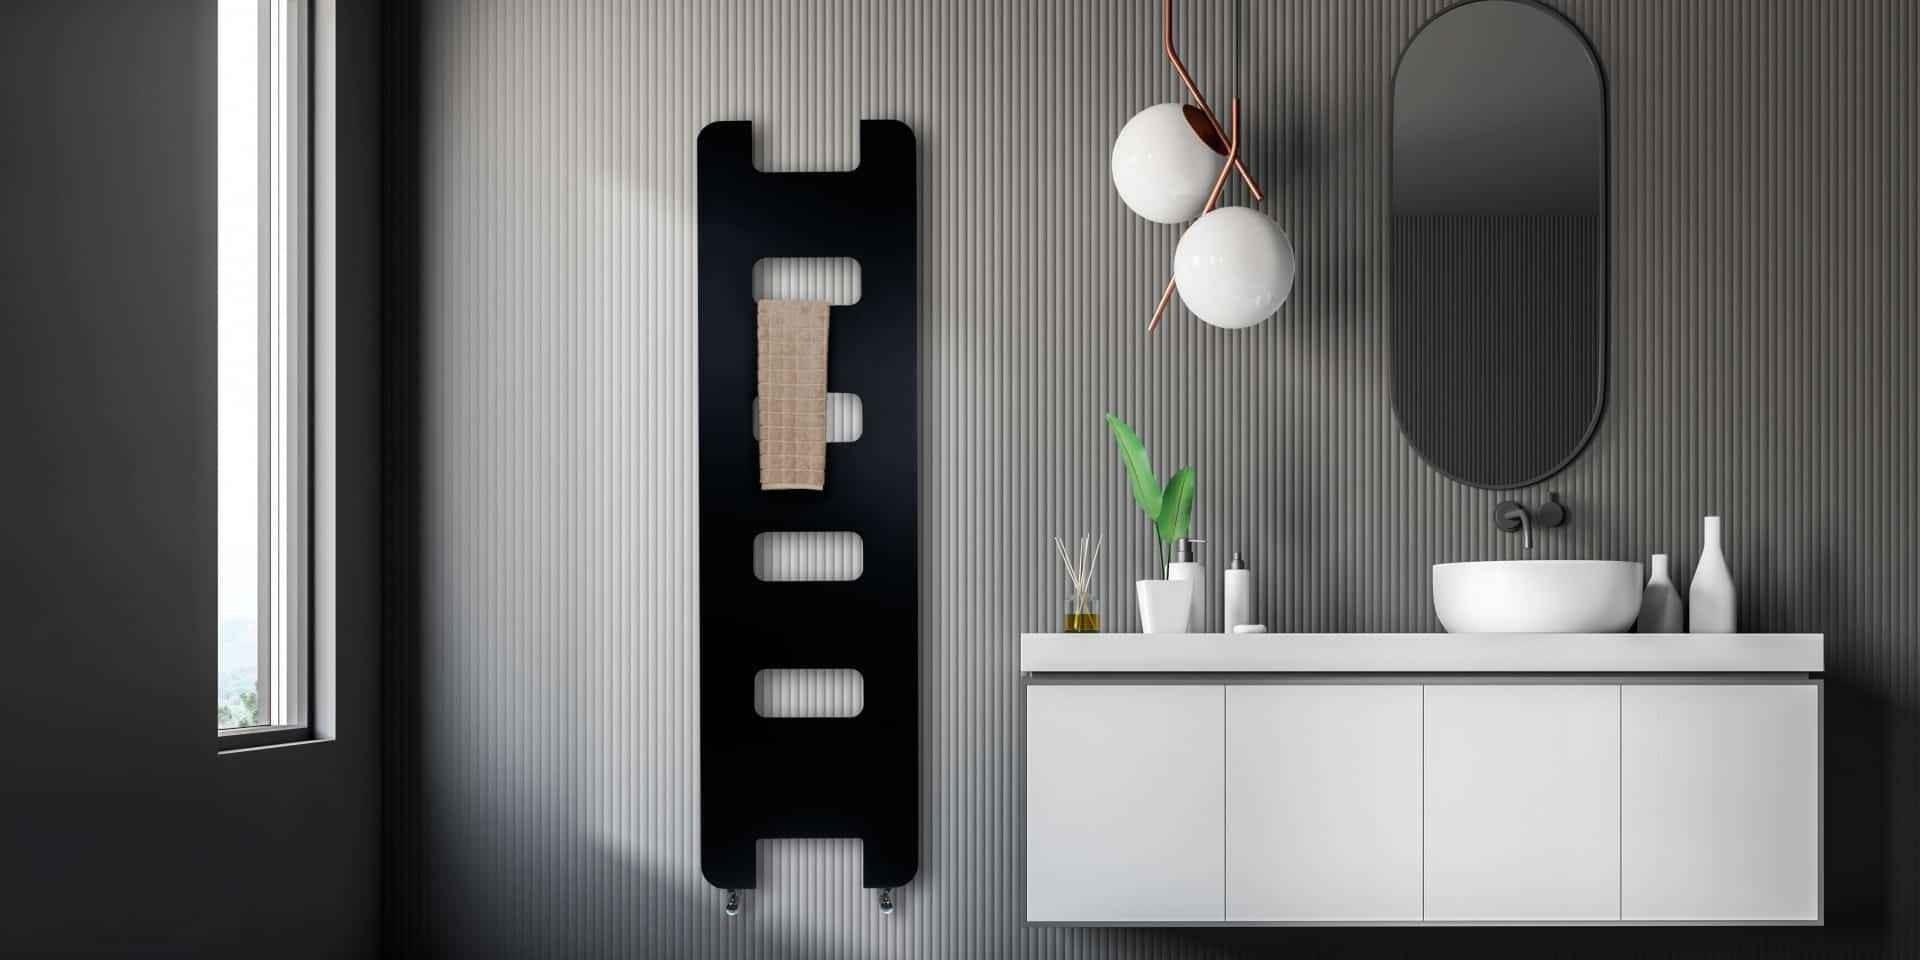 Minoa Design